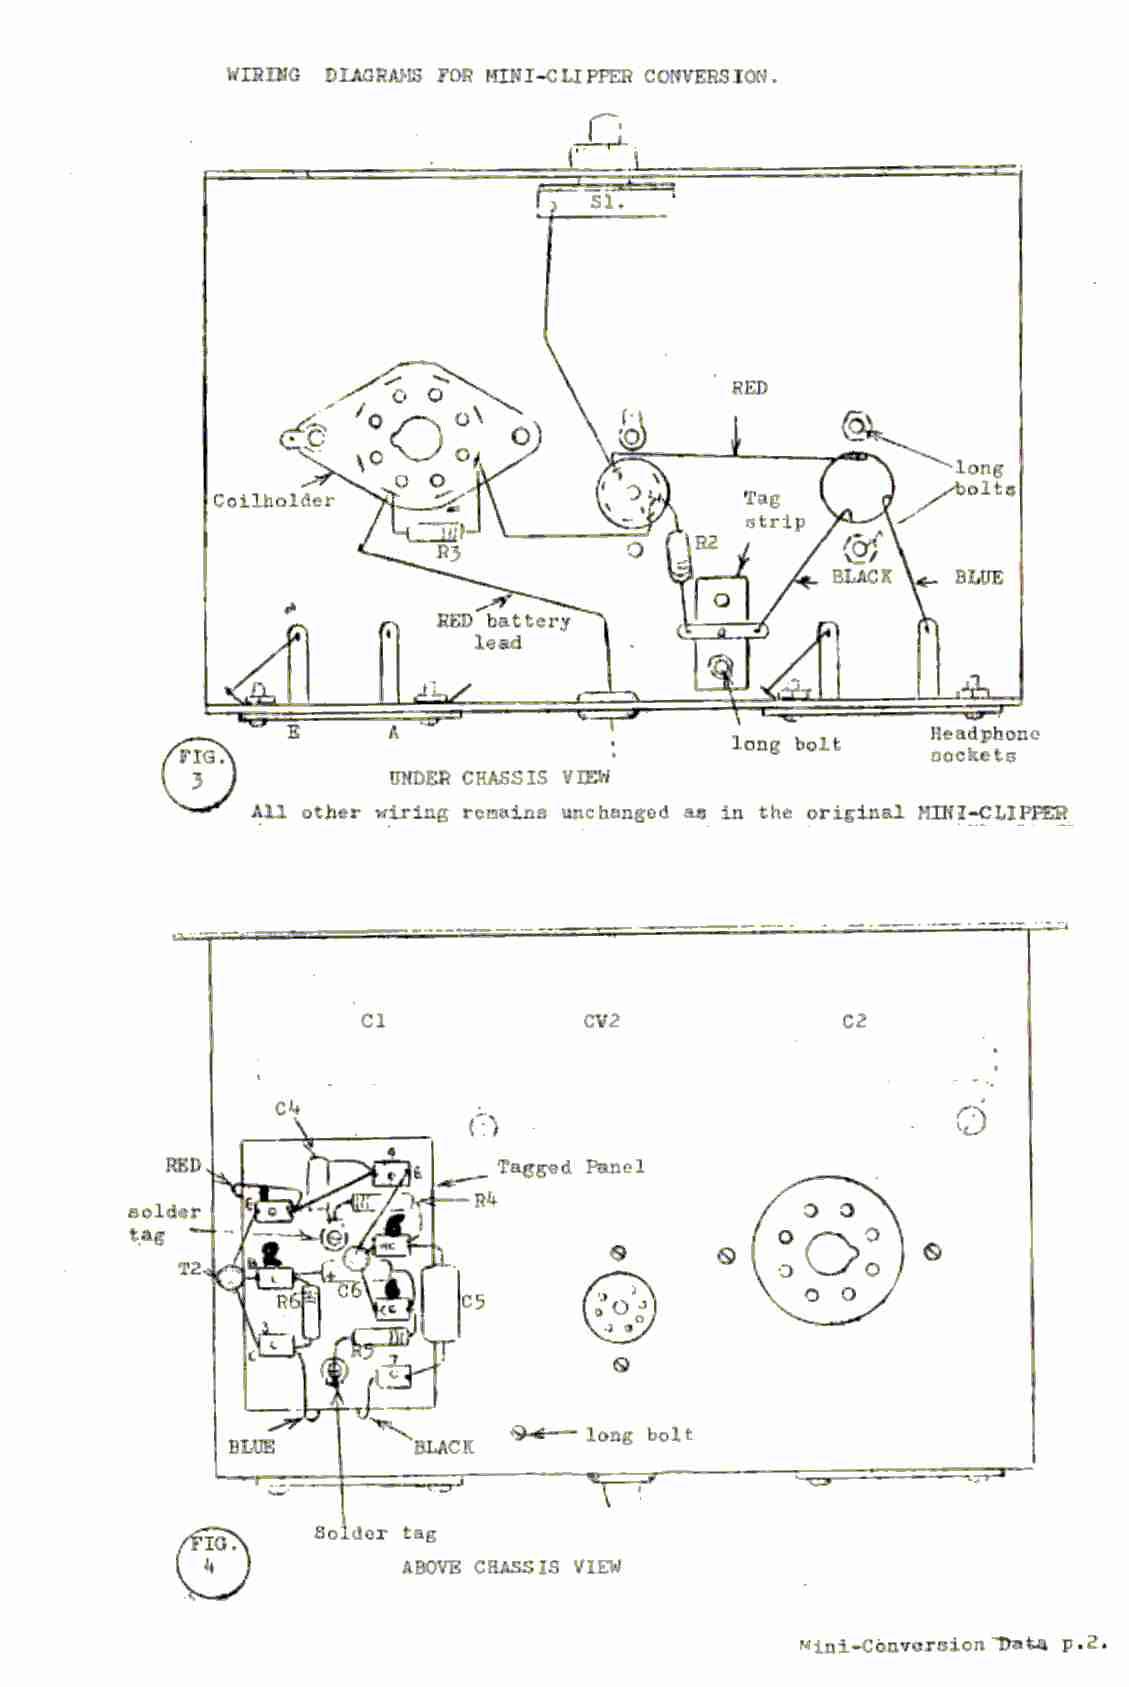 circuit diagram of clipper and clamper prs s2 wiring vintage radio electronics codar mini receiver